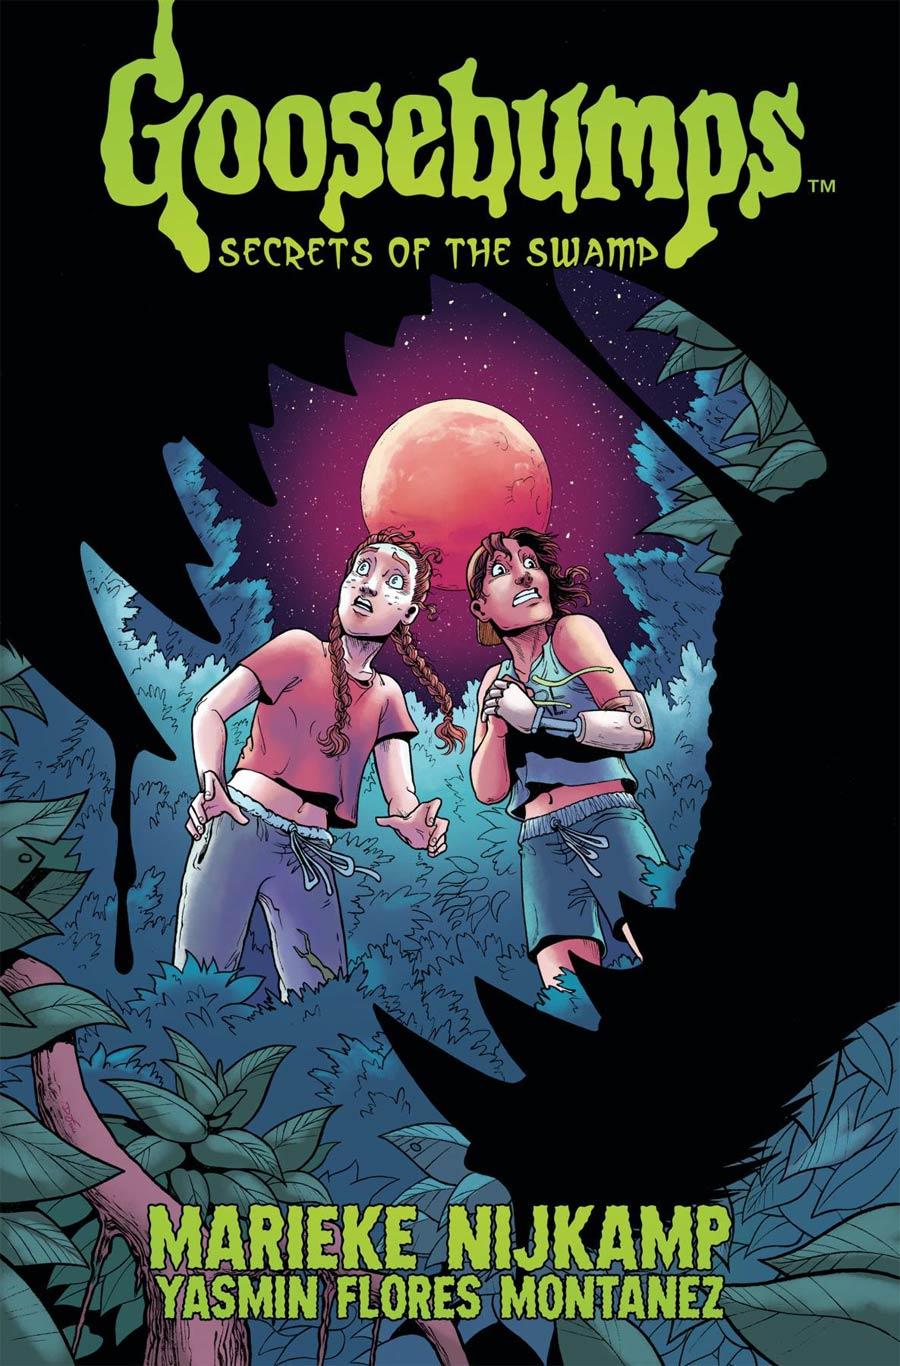 Goosebumps Secrets Of The Swamp TP